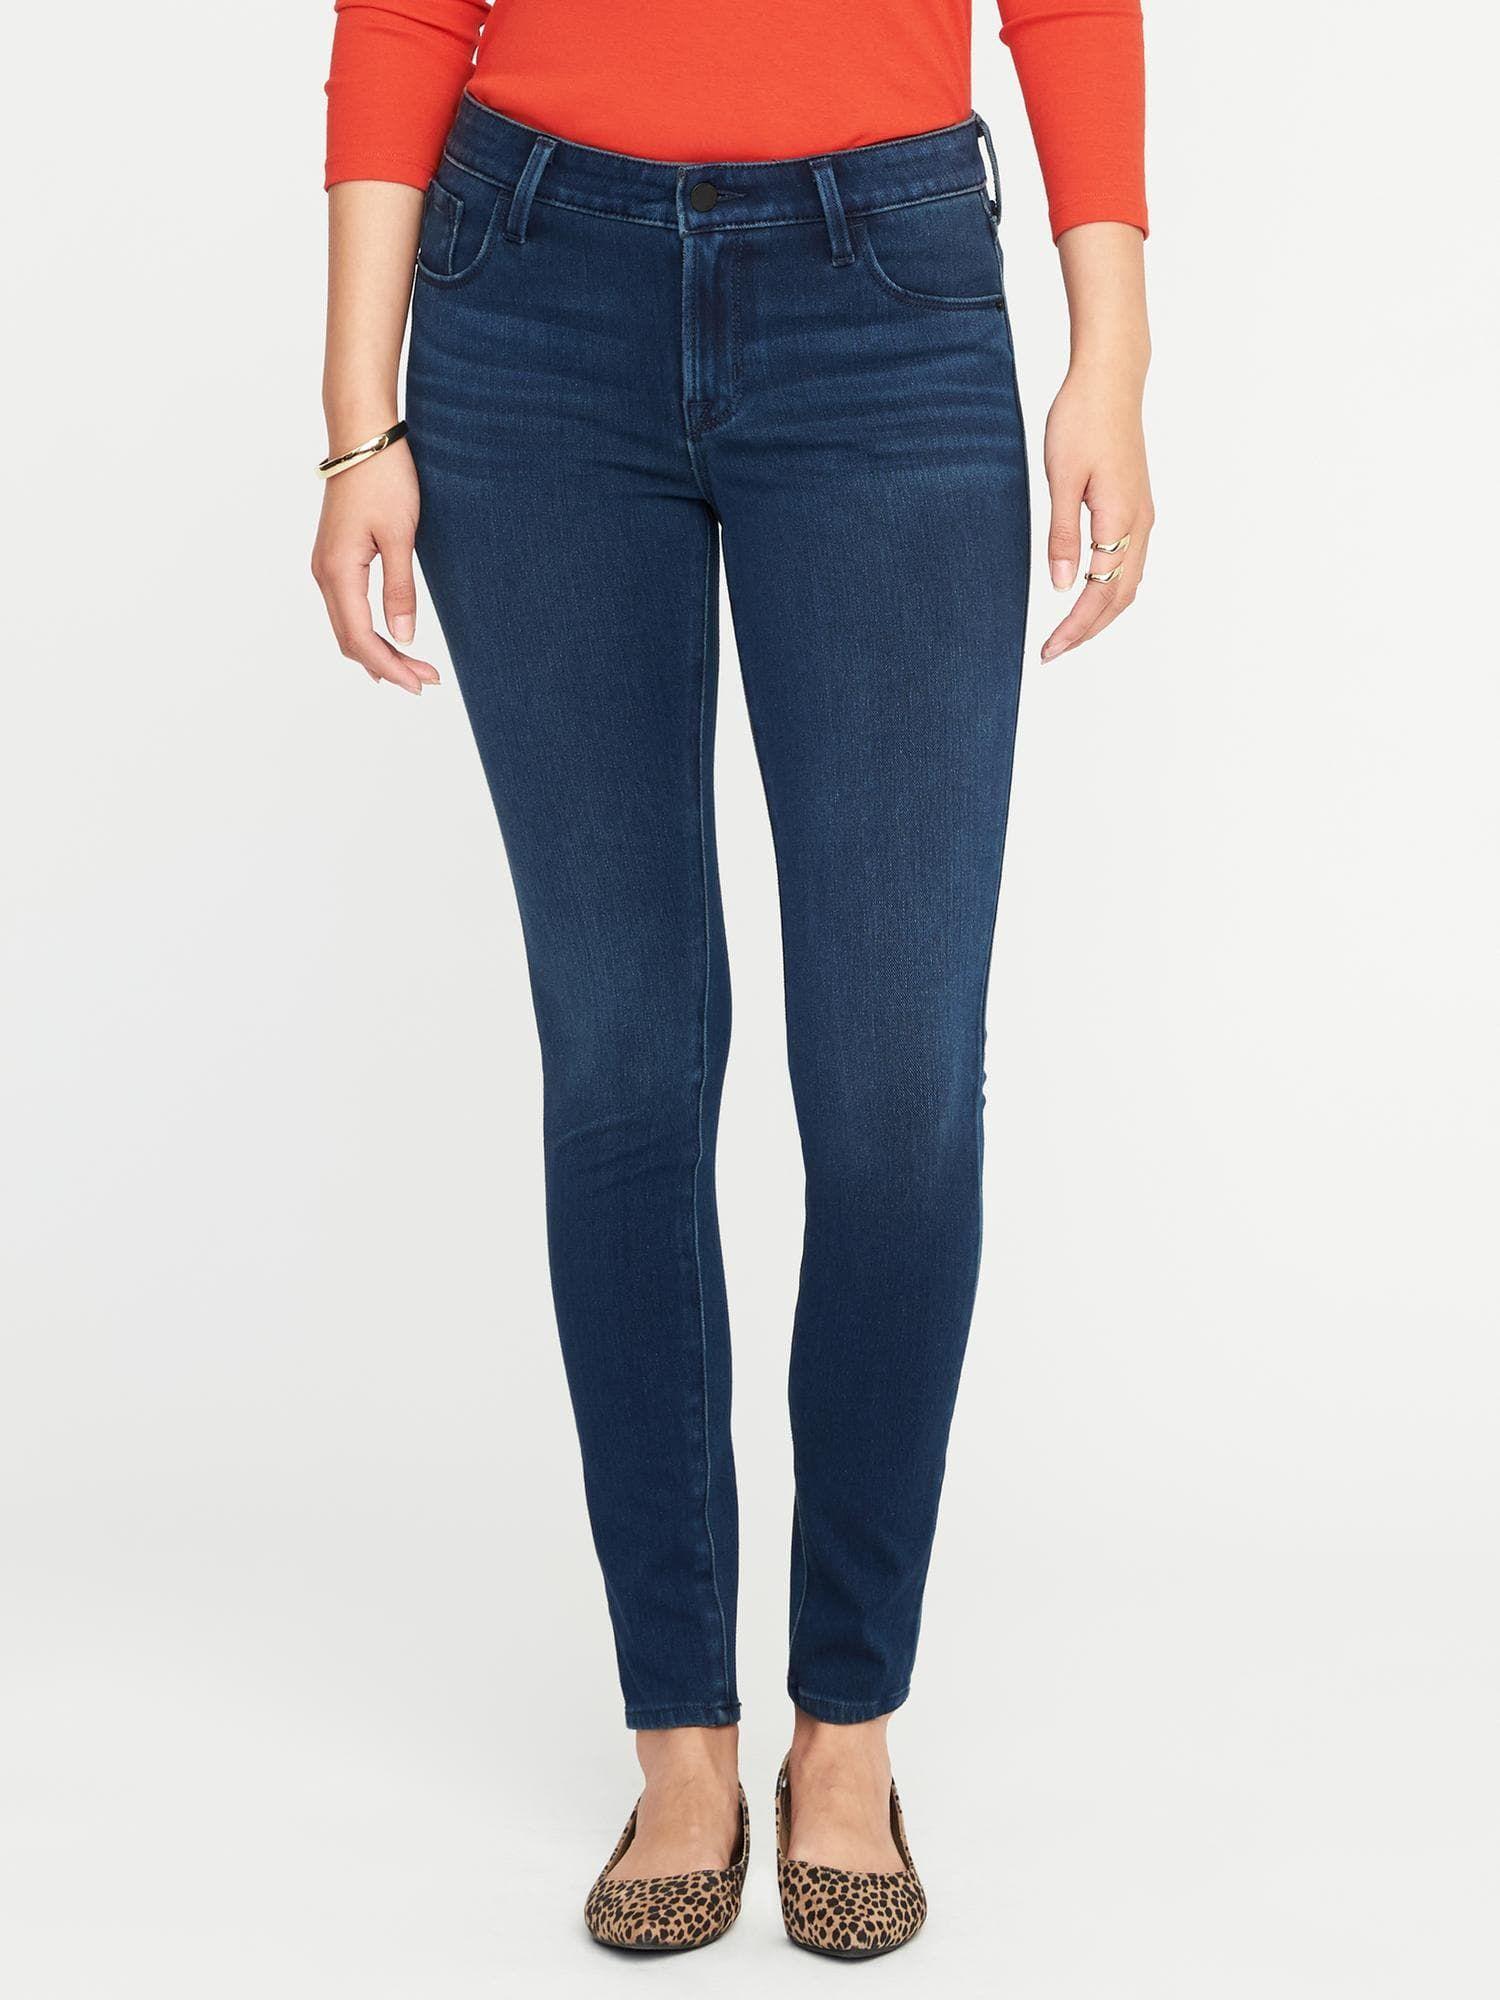 06eebf0ce3e Mid-Rise Rockstar 24 7 Jeans for Women